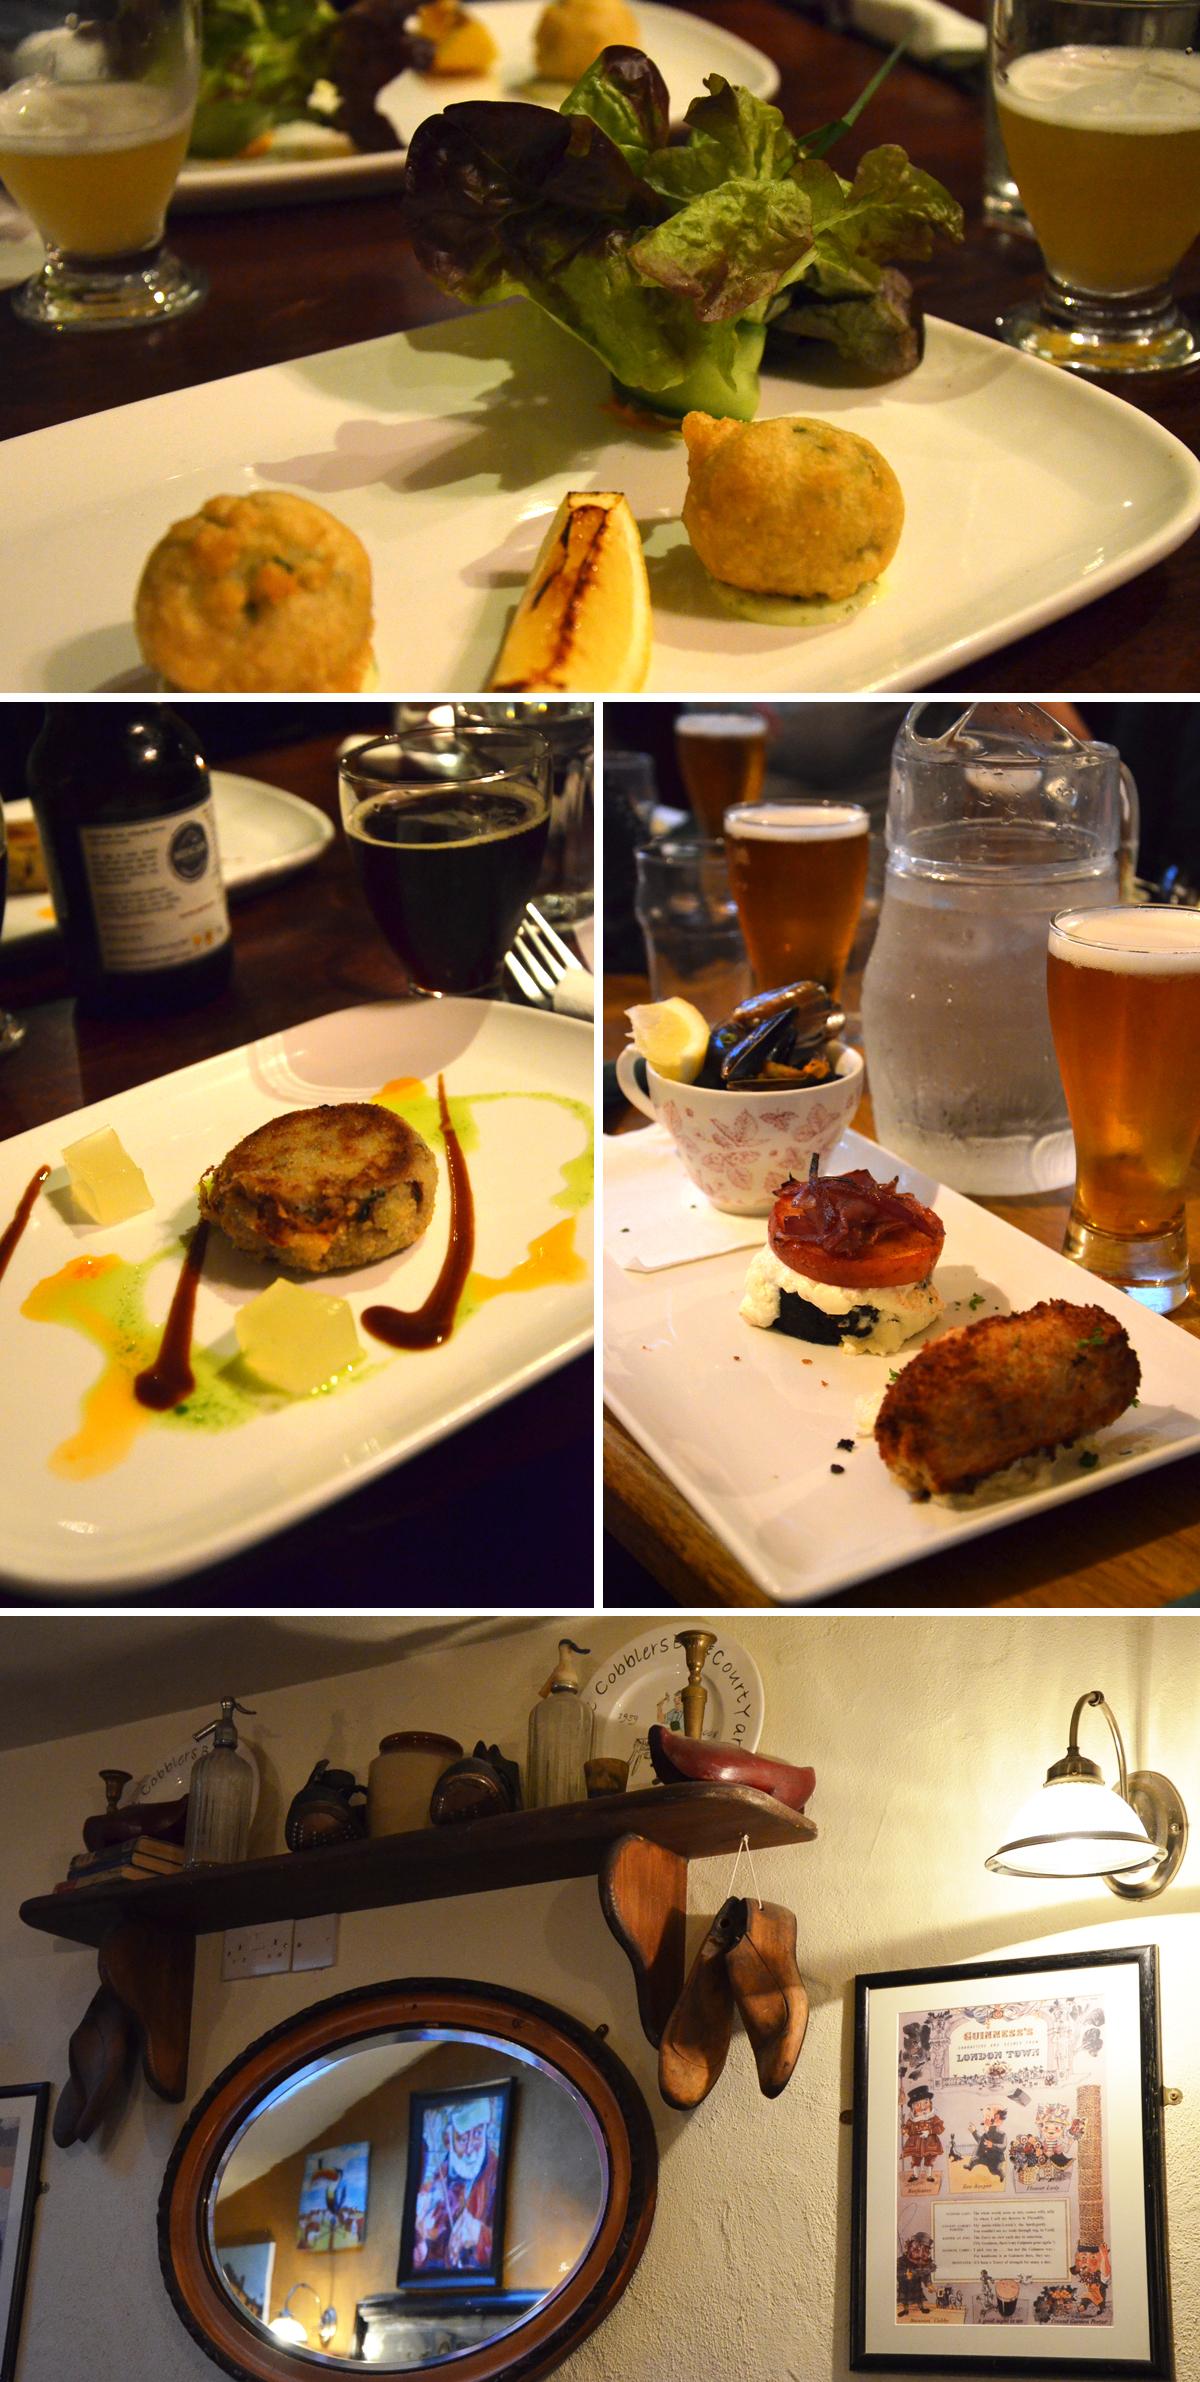 L'Irlande hors des sentiers battus : Irish craft beer & gourmet tapas tour